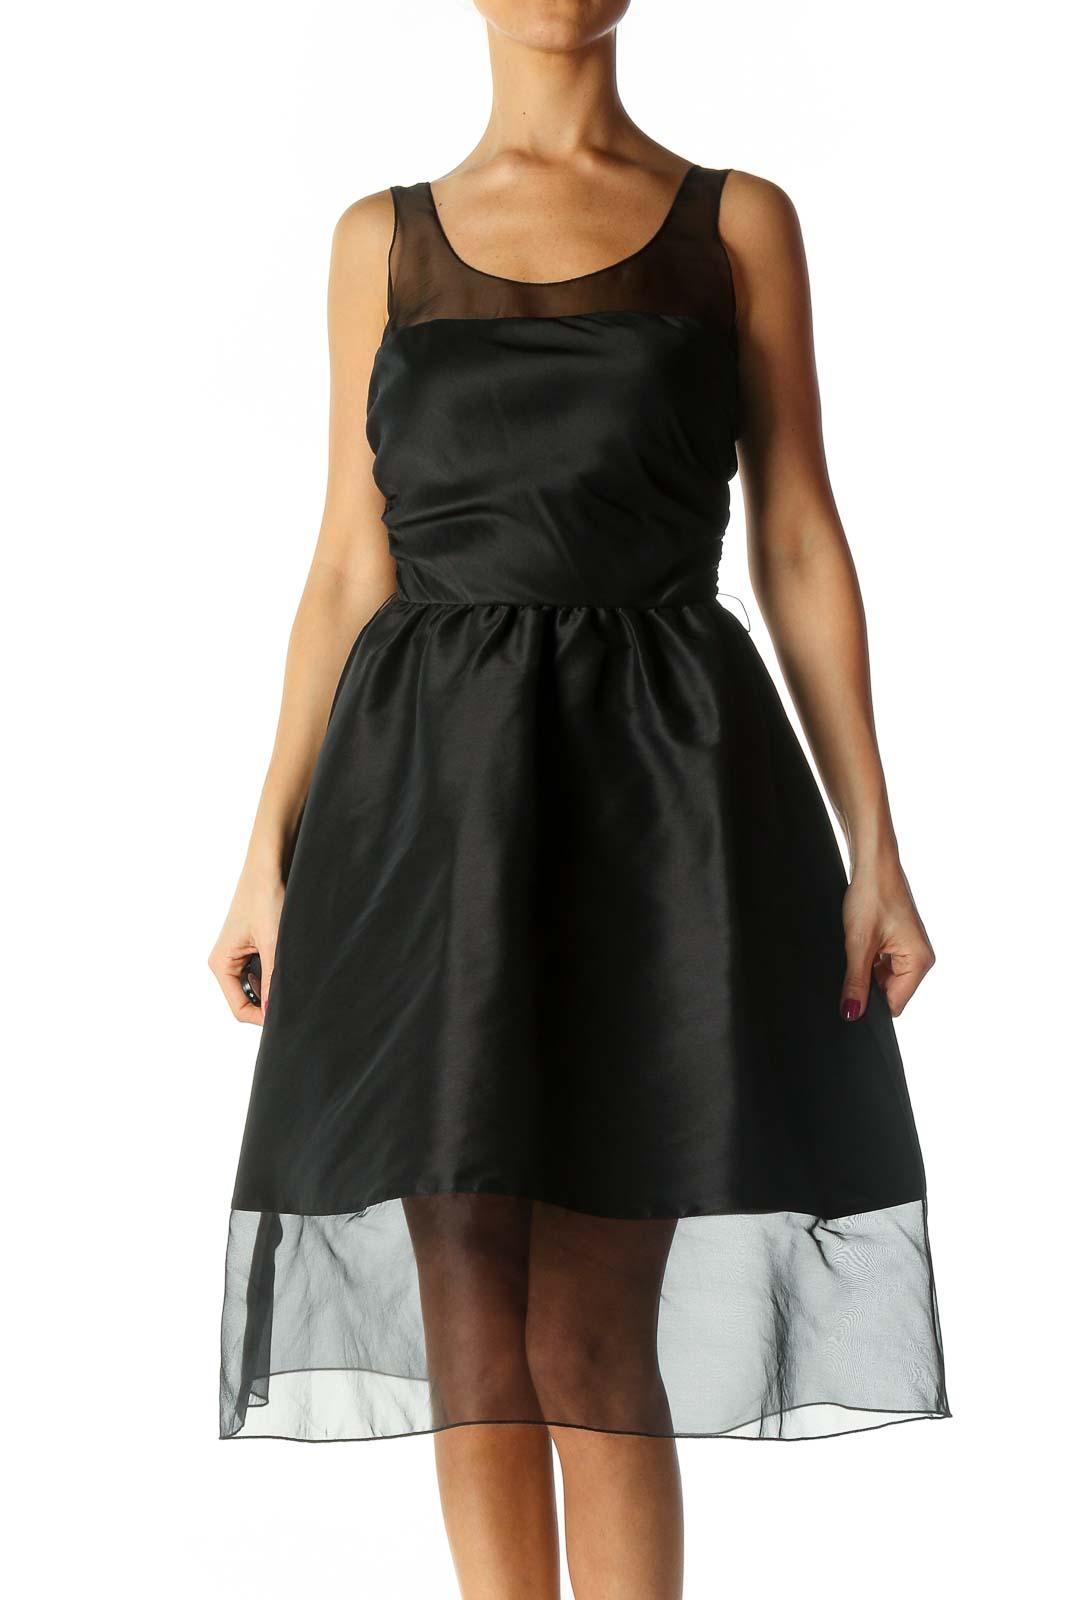 Black Solid Cocktail Dress Front